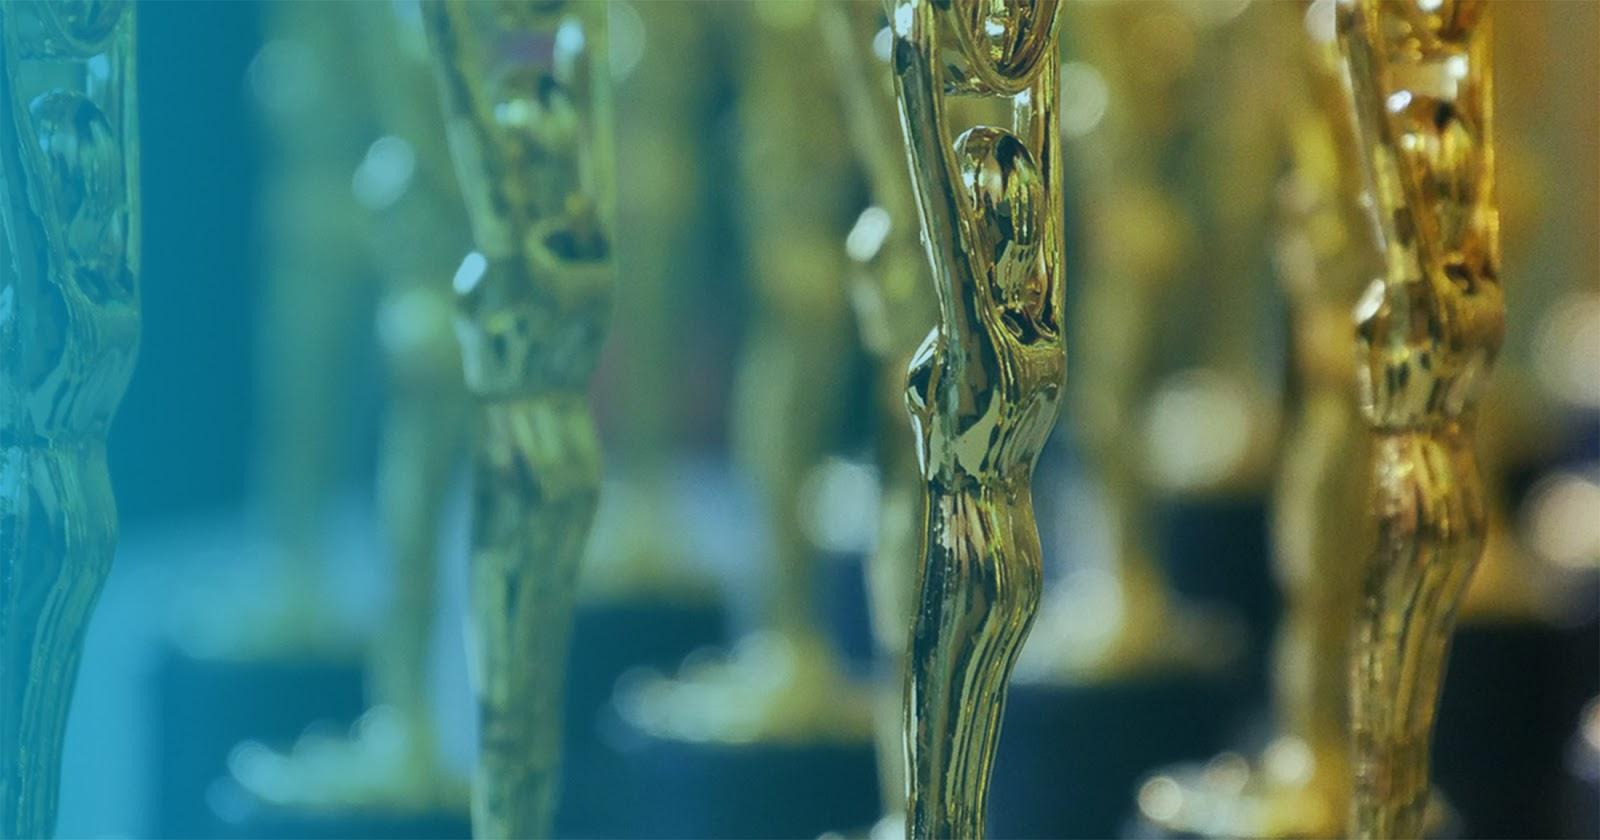 Multiple awards